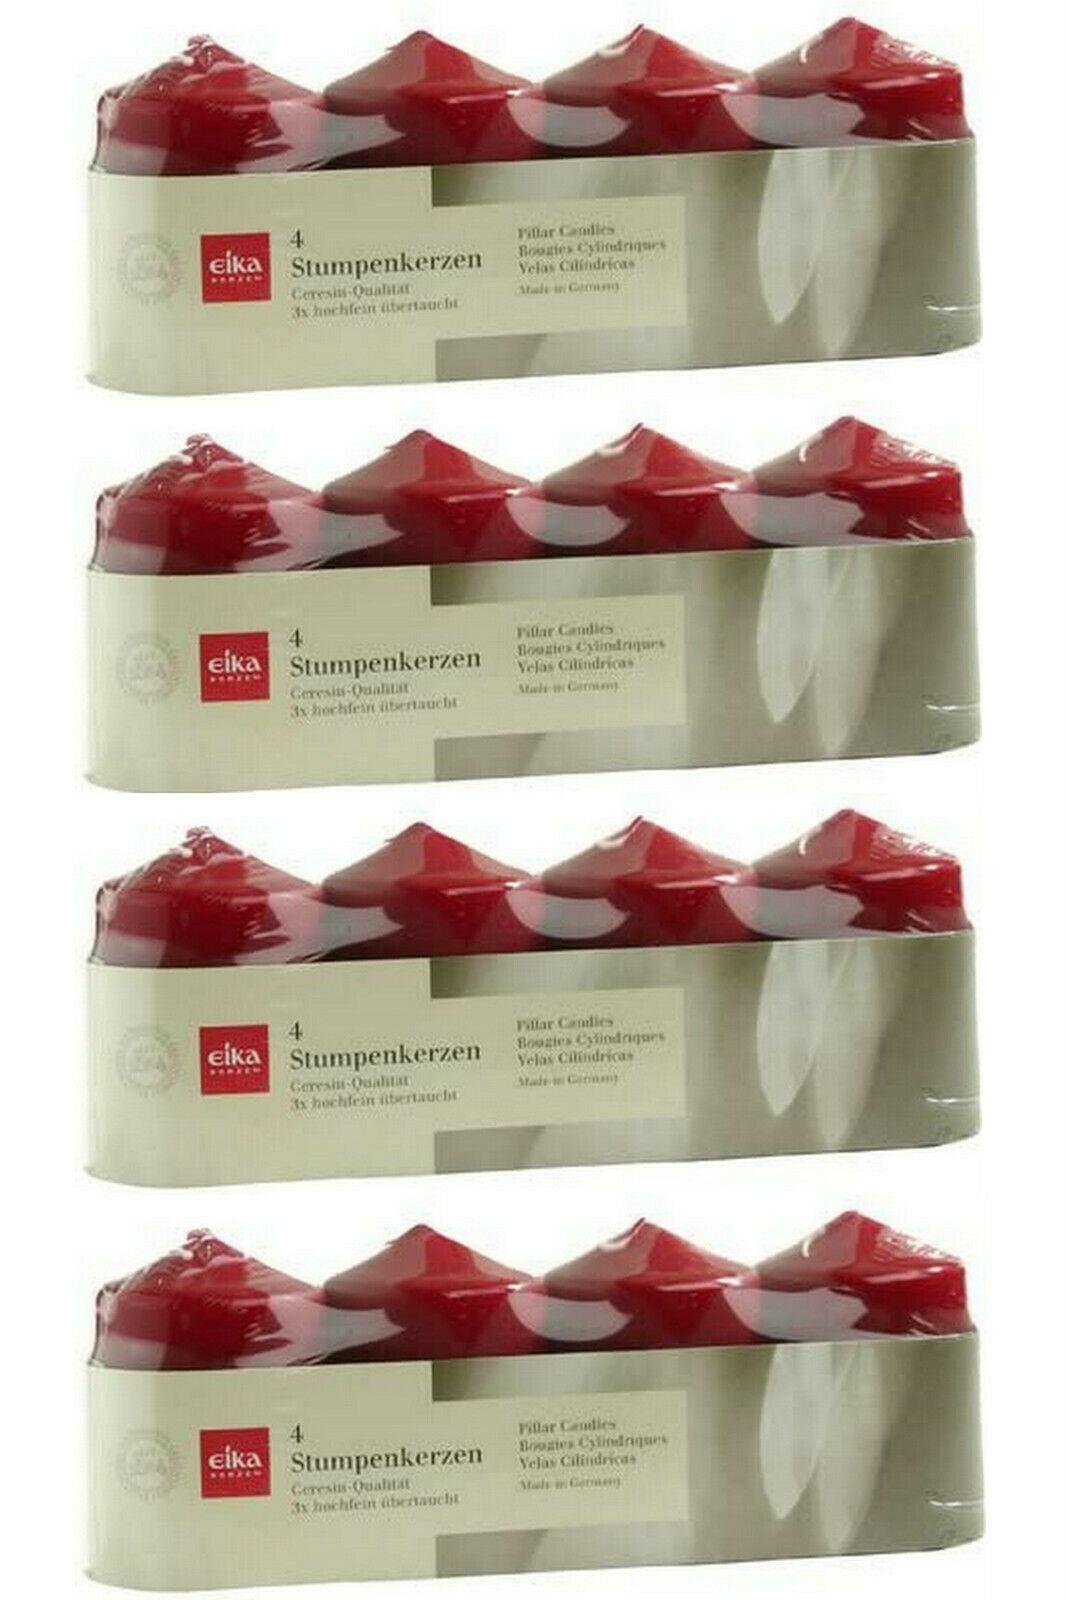 16 Stück Eika Stumpenkerzen 80x60 mm Qualitäts-Kerzen Stumpen Kerze 4 x 4er Pack - Bordeaux